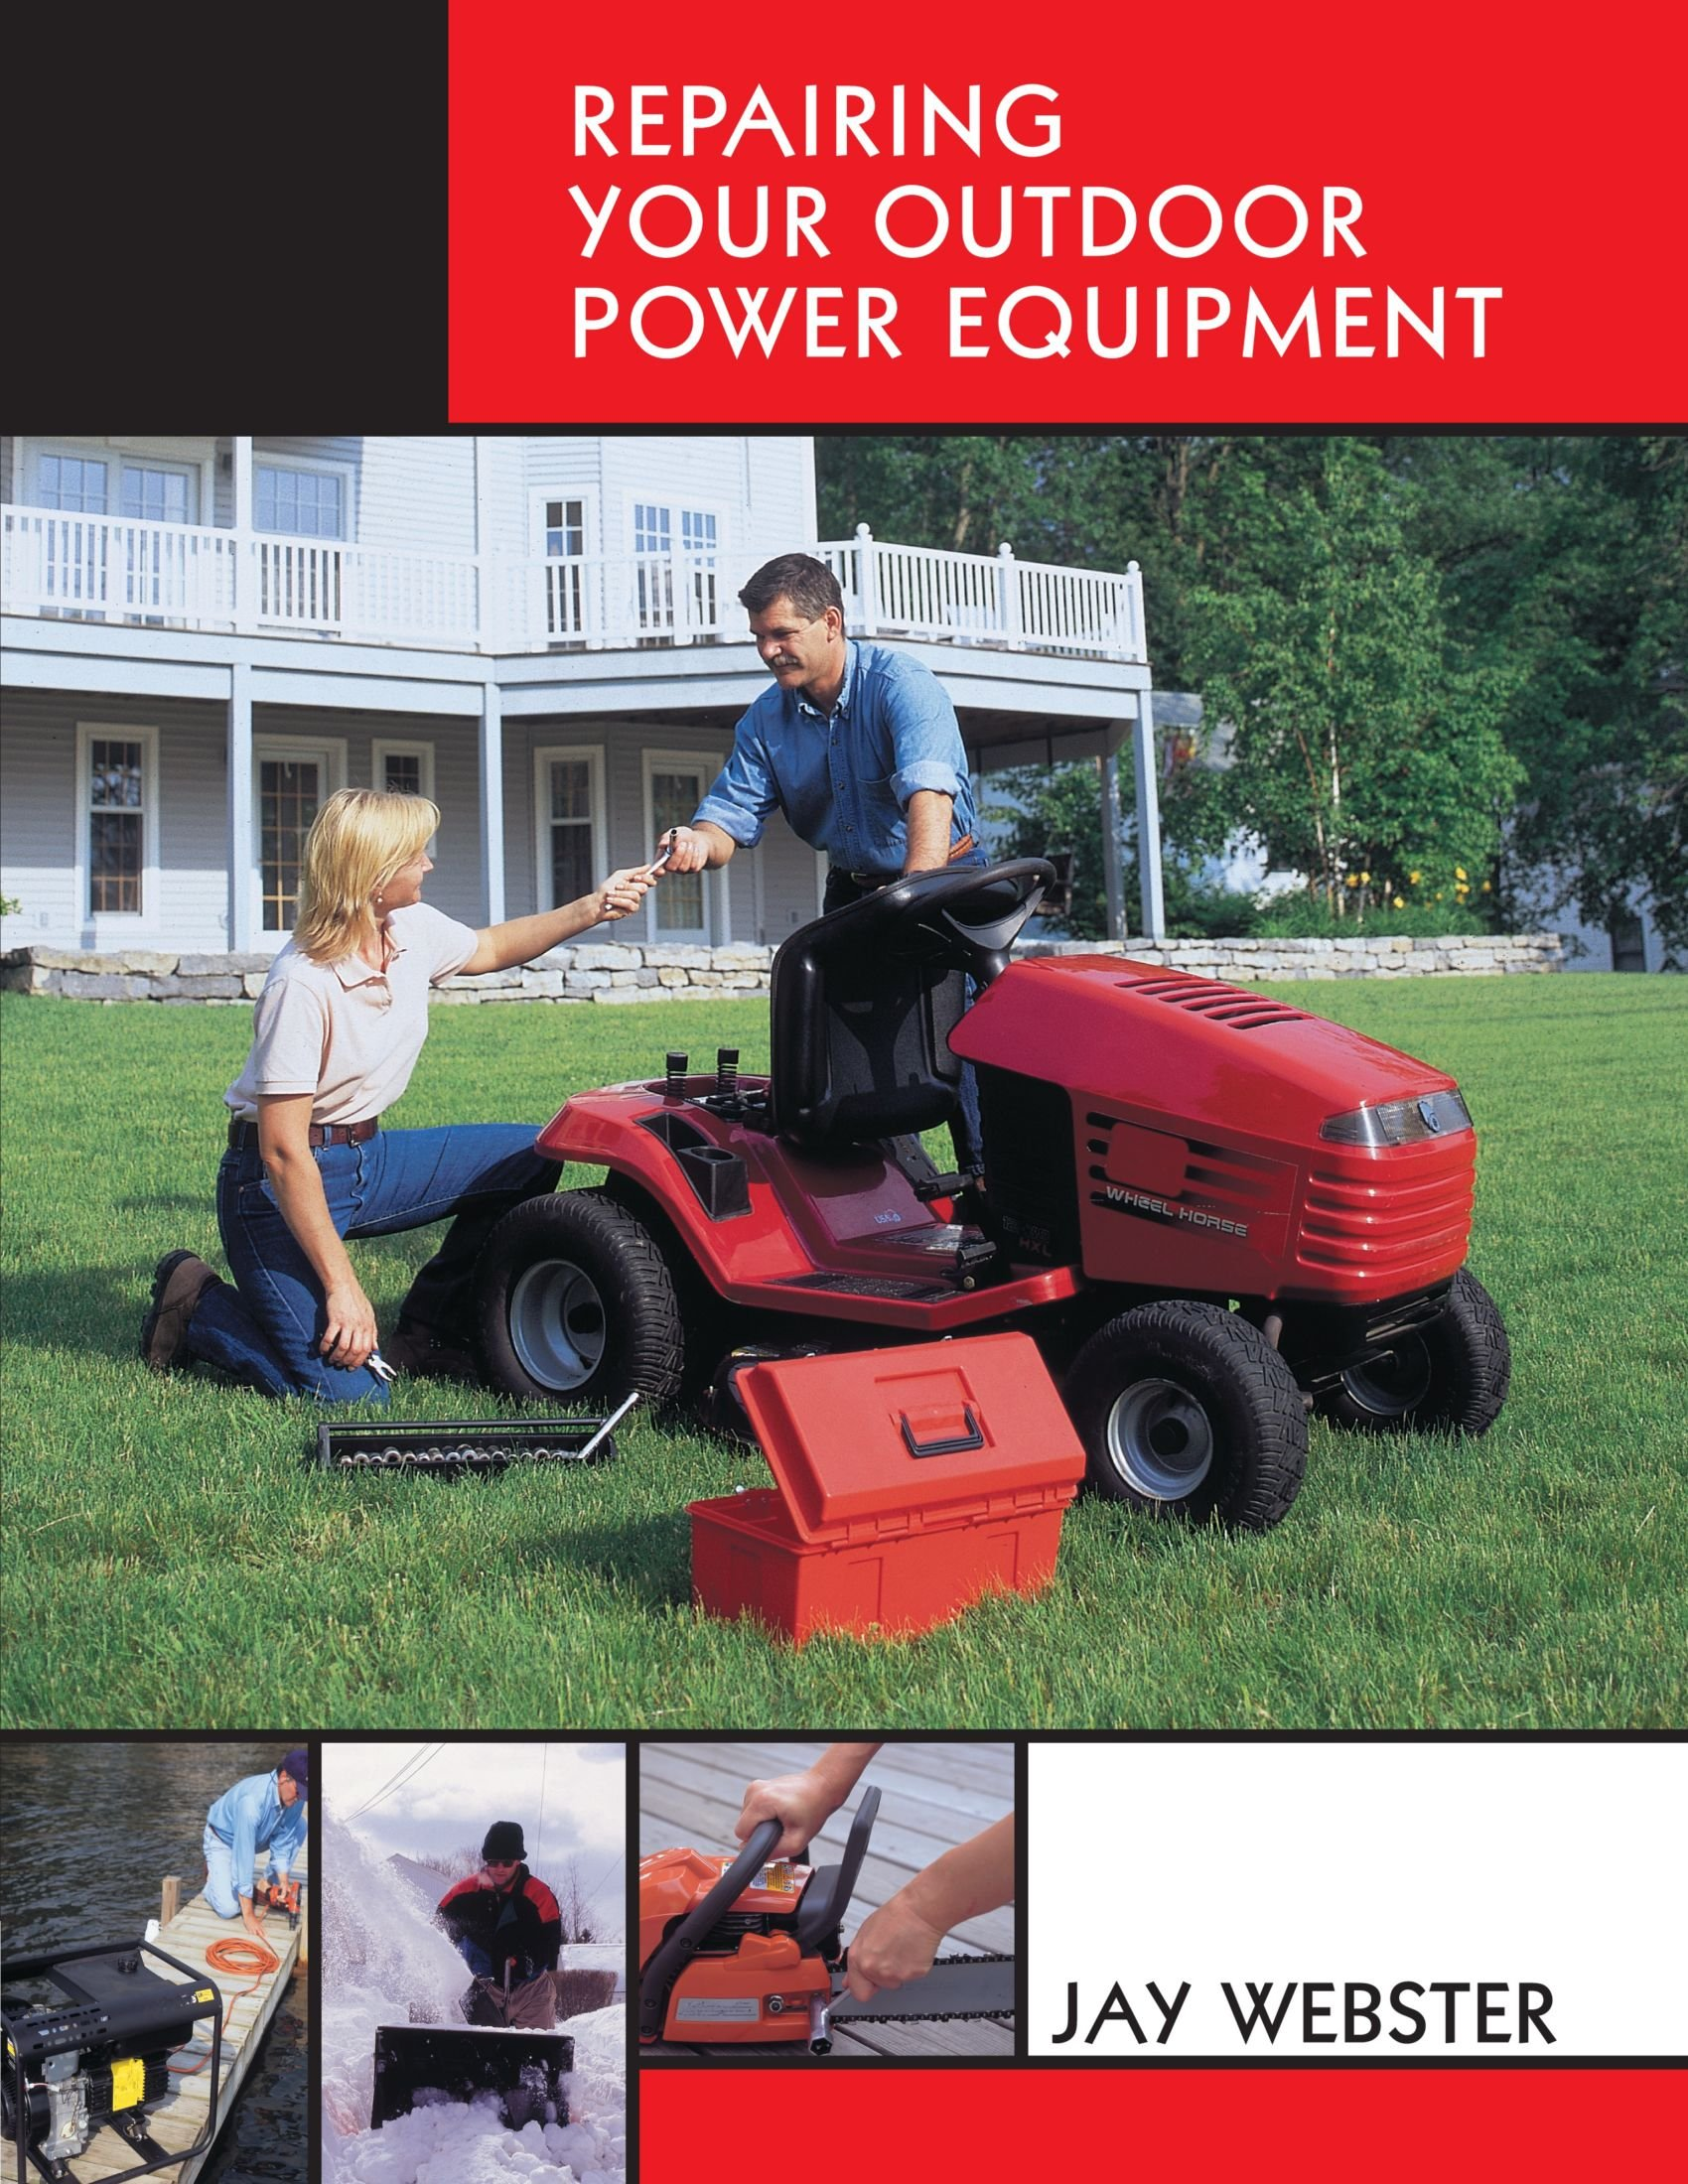 Repairing Your Outdoor Power Equipment (Trade)